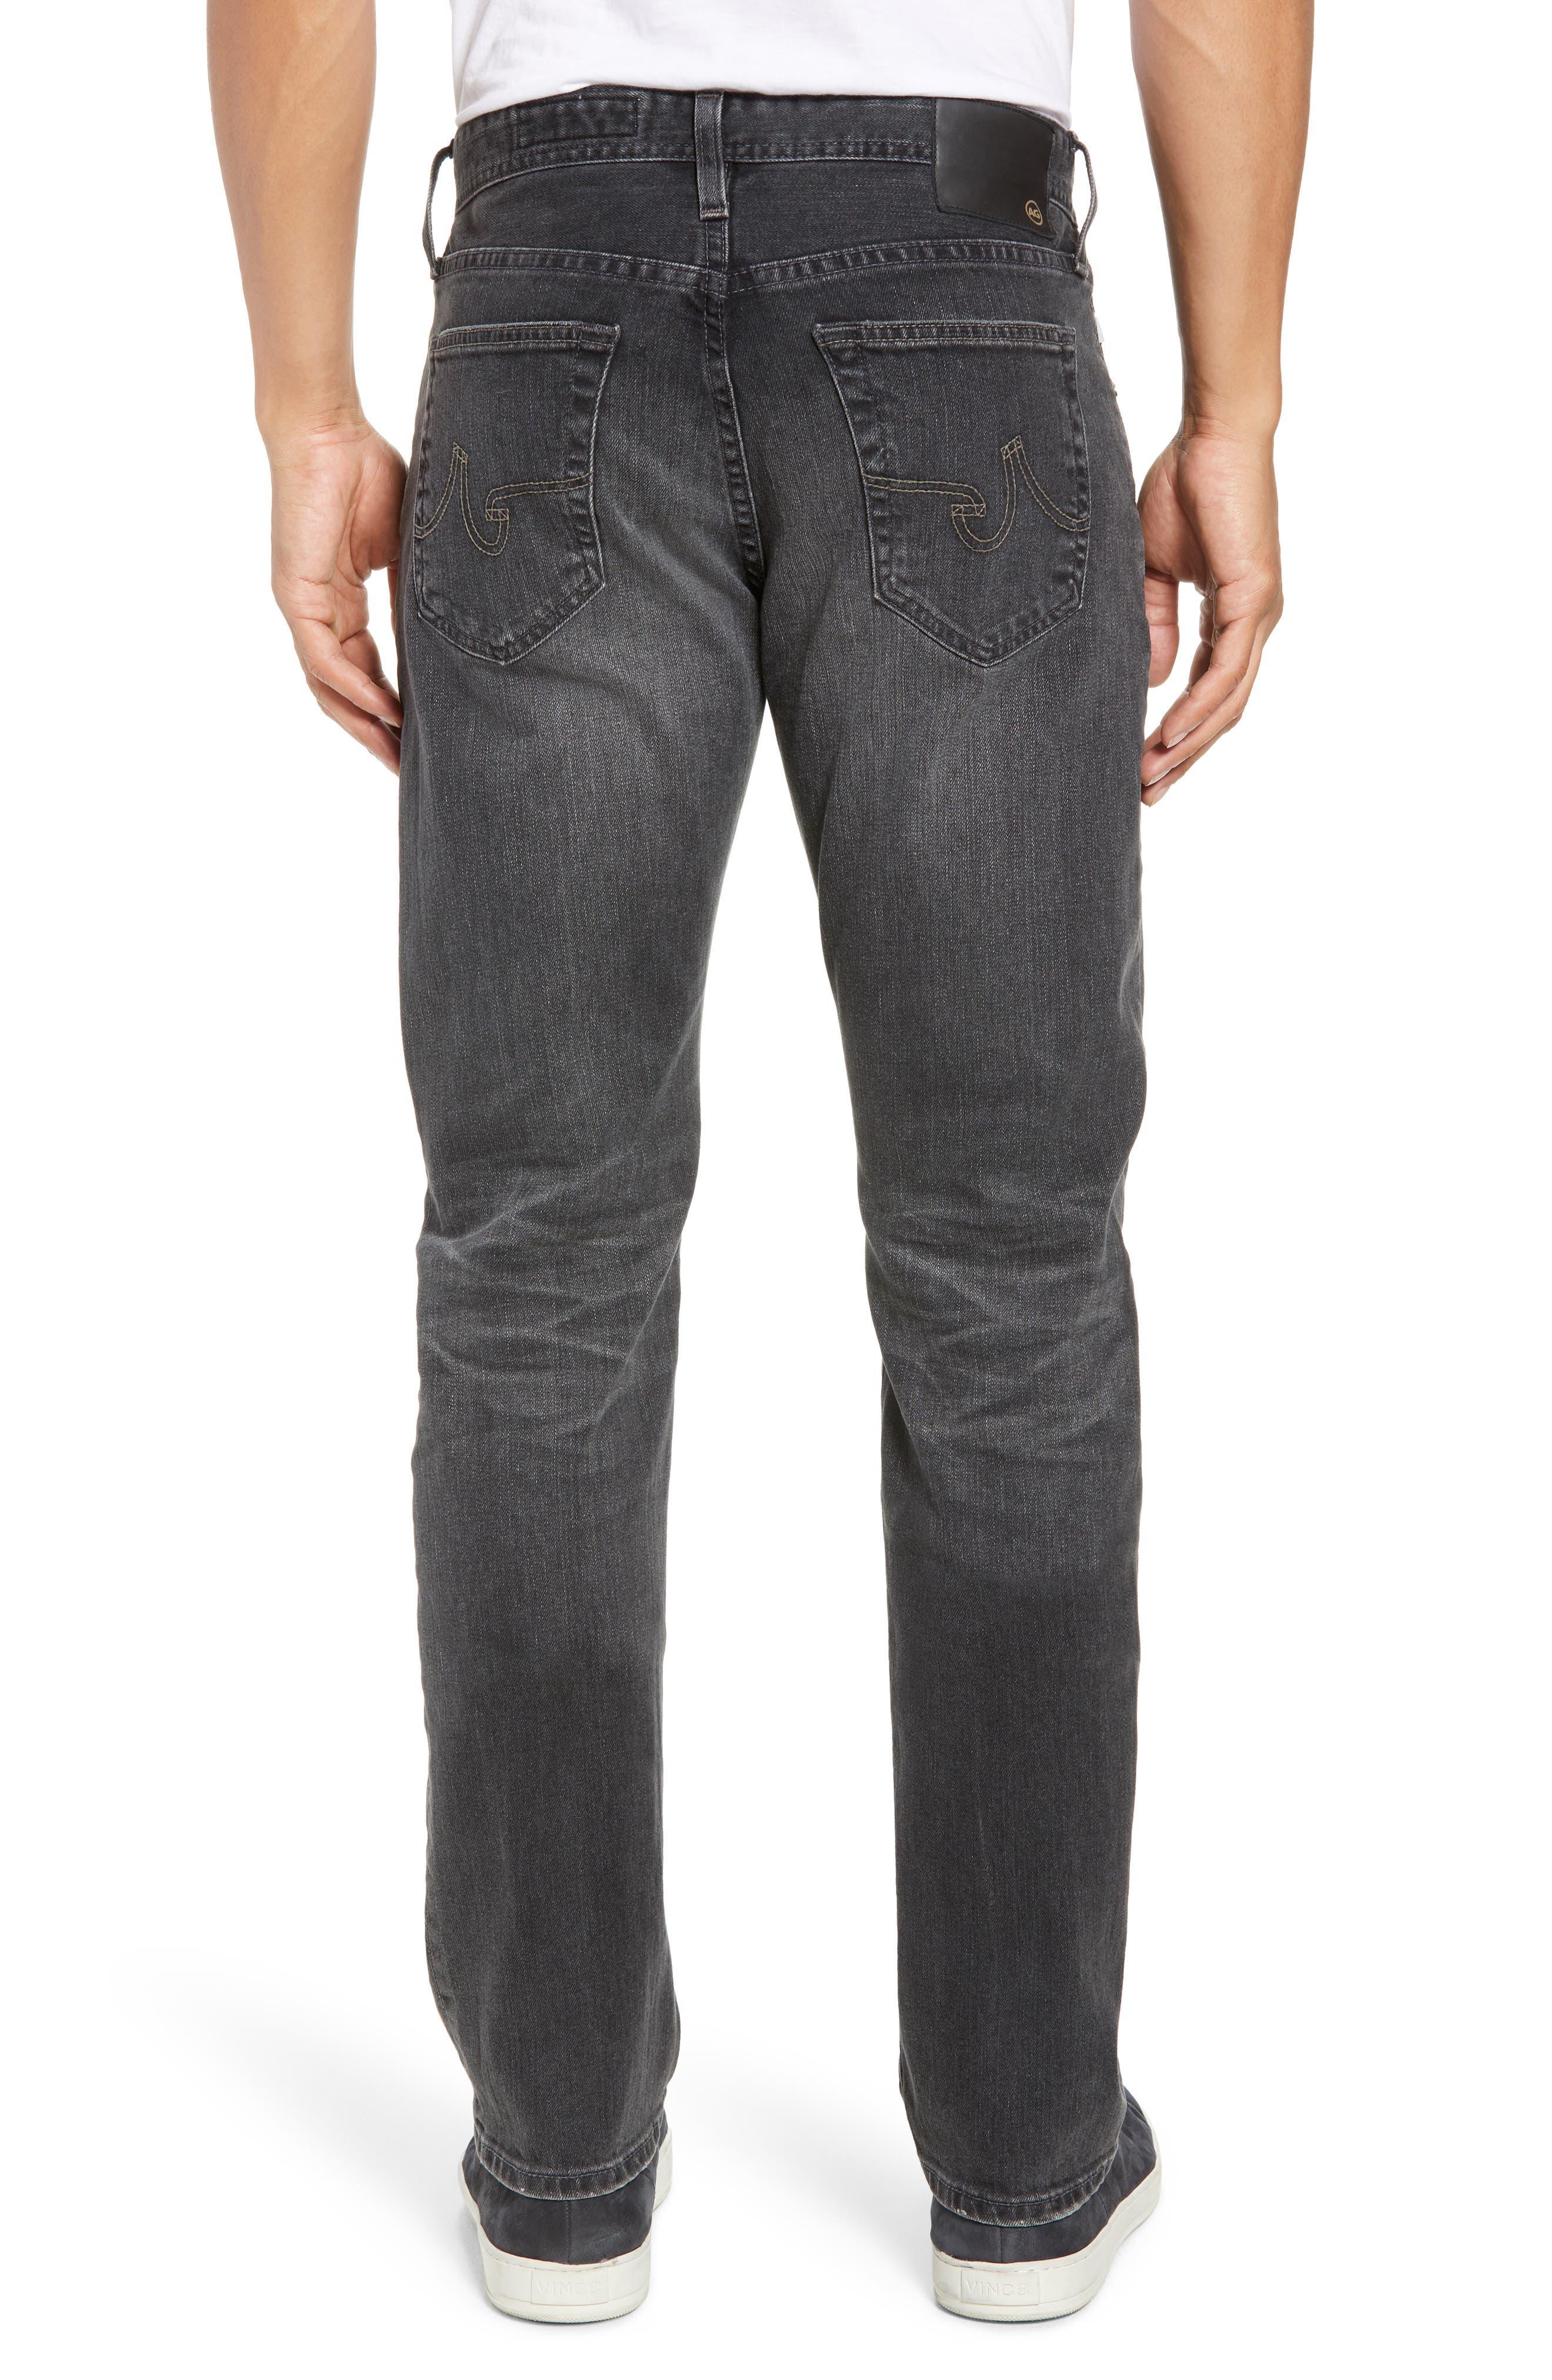 Everett Slim Straight Leg Jeans,                             Alternate thumbnail 2, color,                             6 YEARS ARCADE